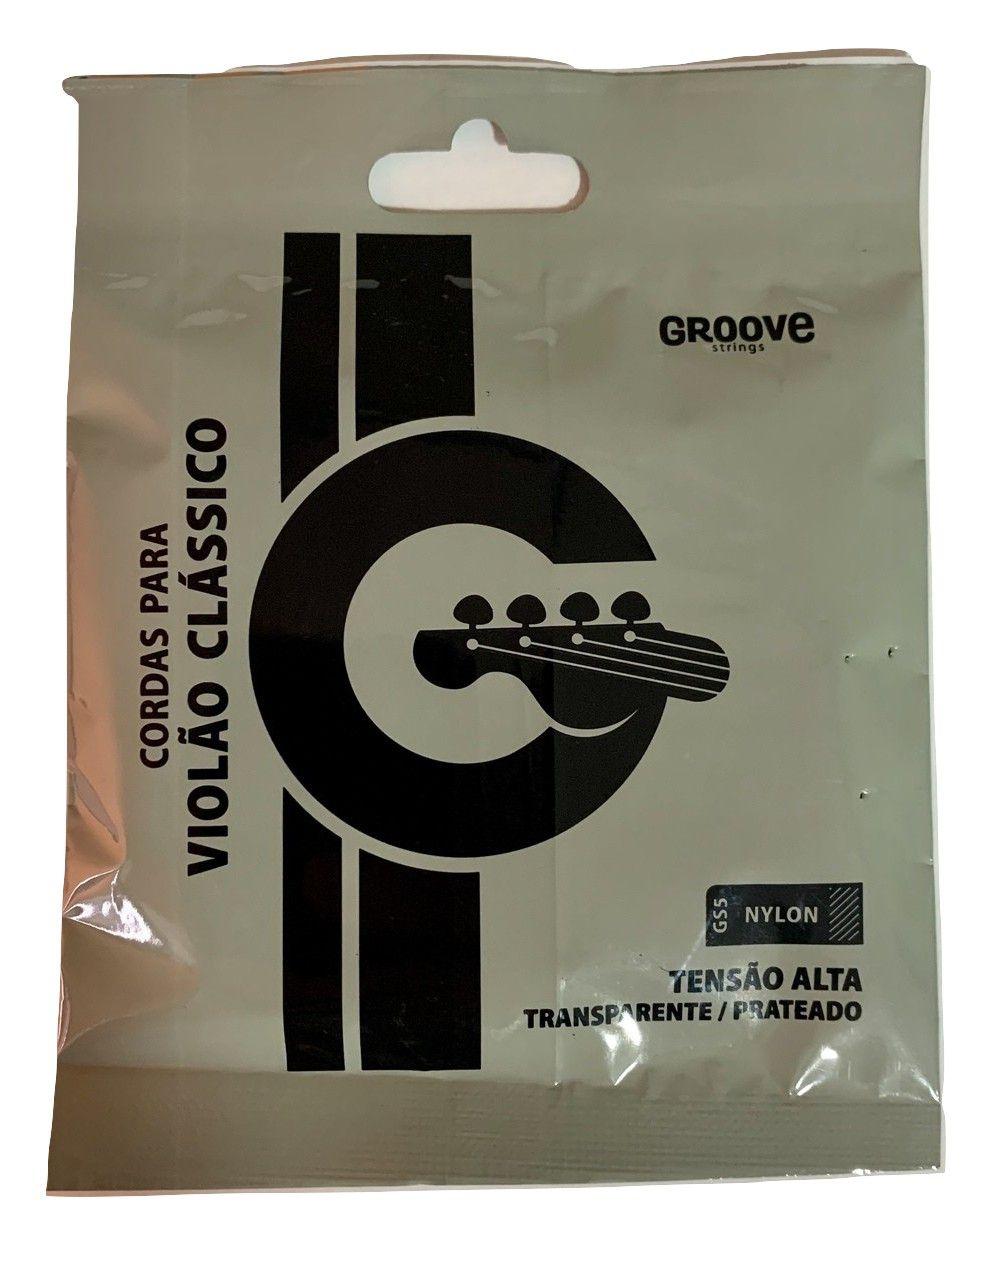 Encordoamento Violão Nylon Groove GS5